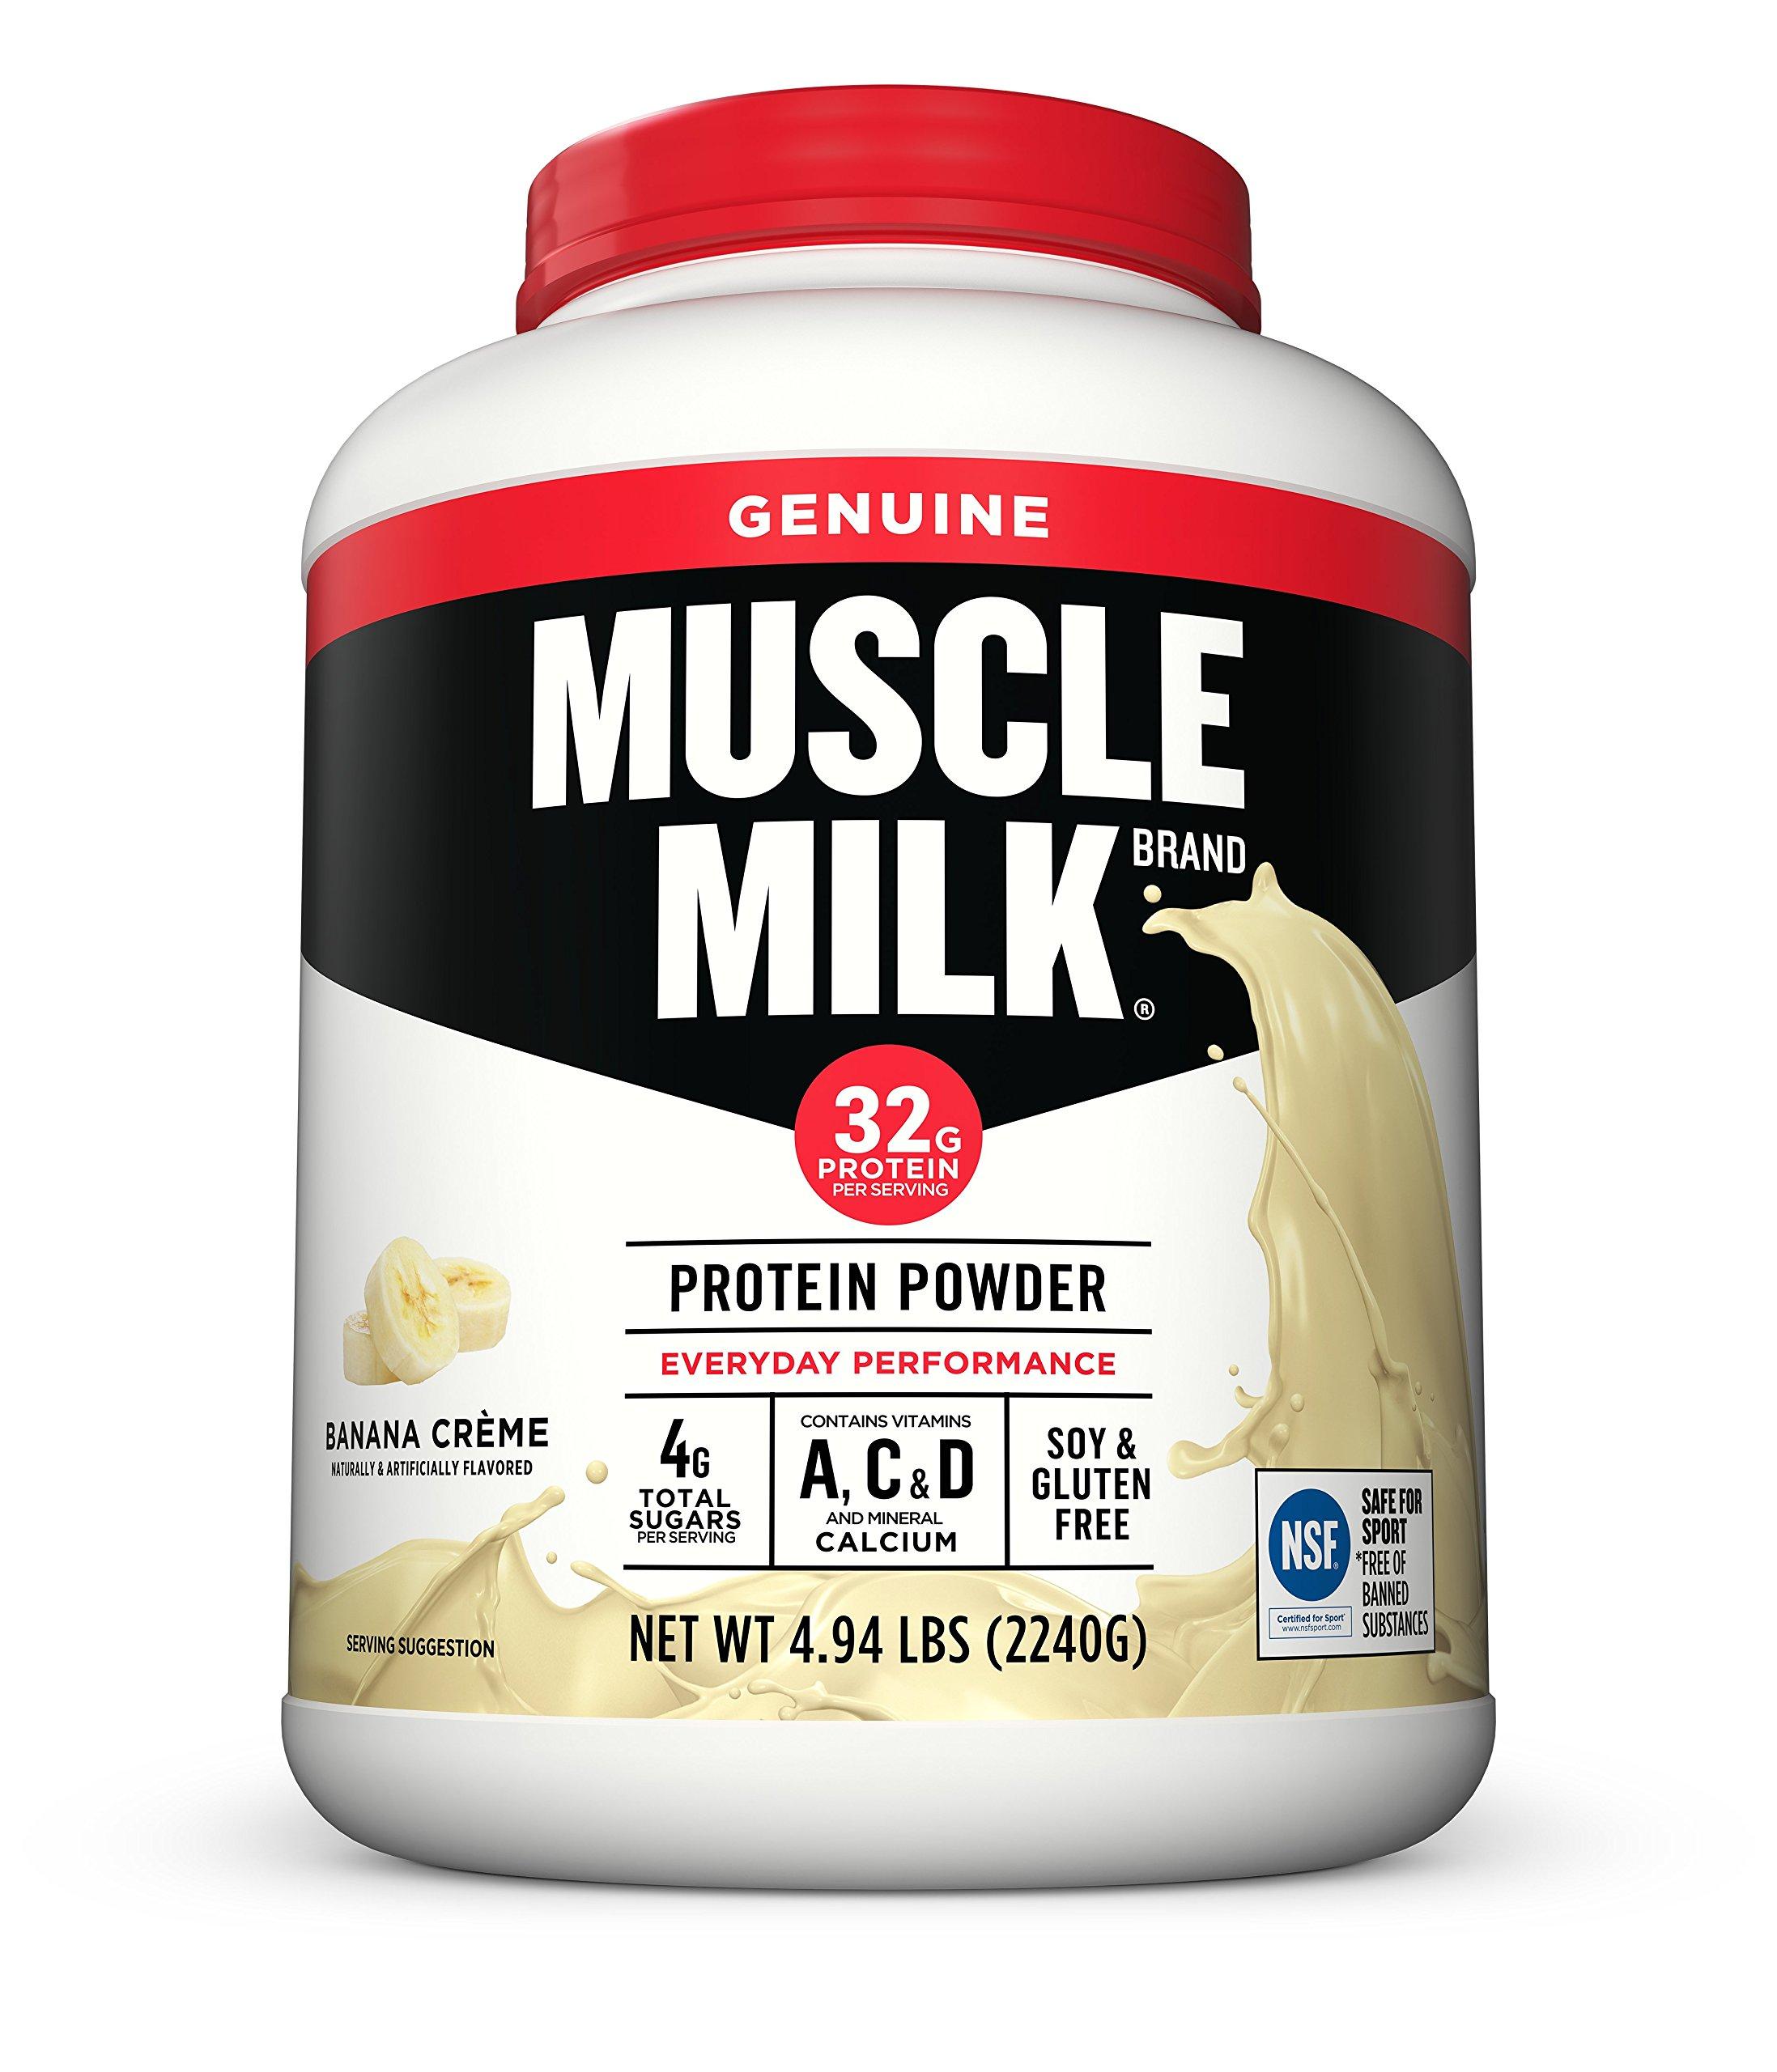 Muscle Milk Genuine Protein Powder, Banana Crème, 32g Protein, 4.94 Pound by CytoSport